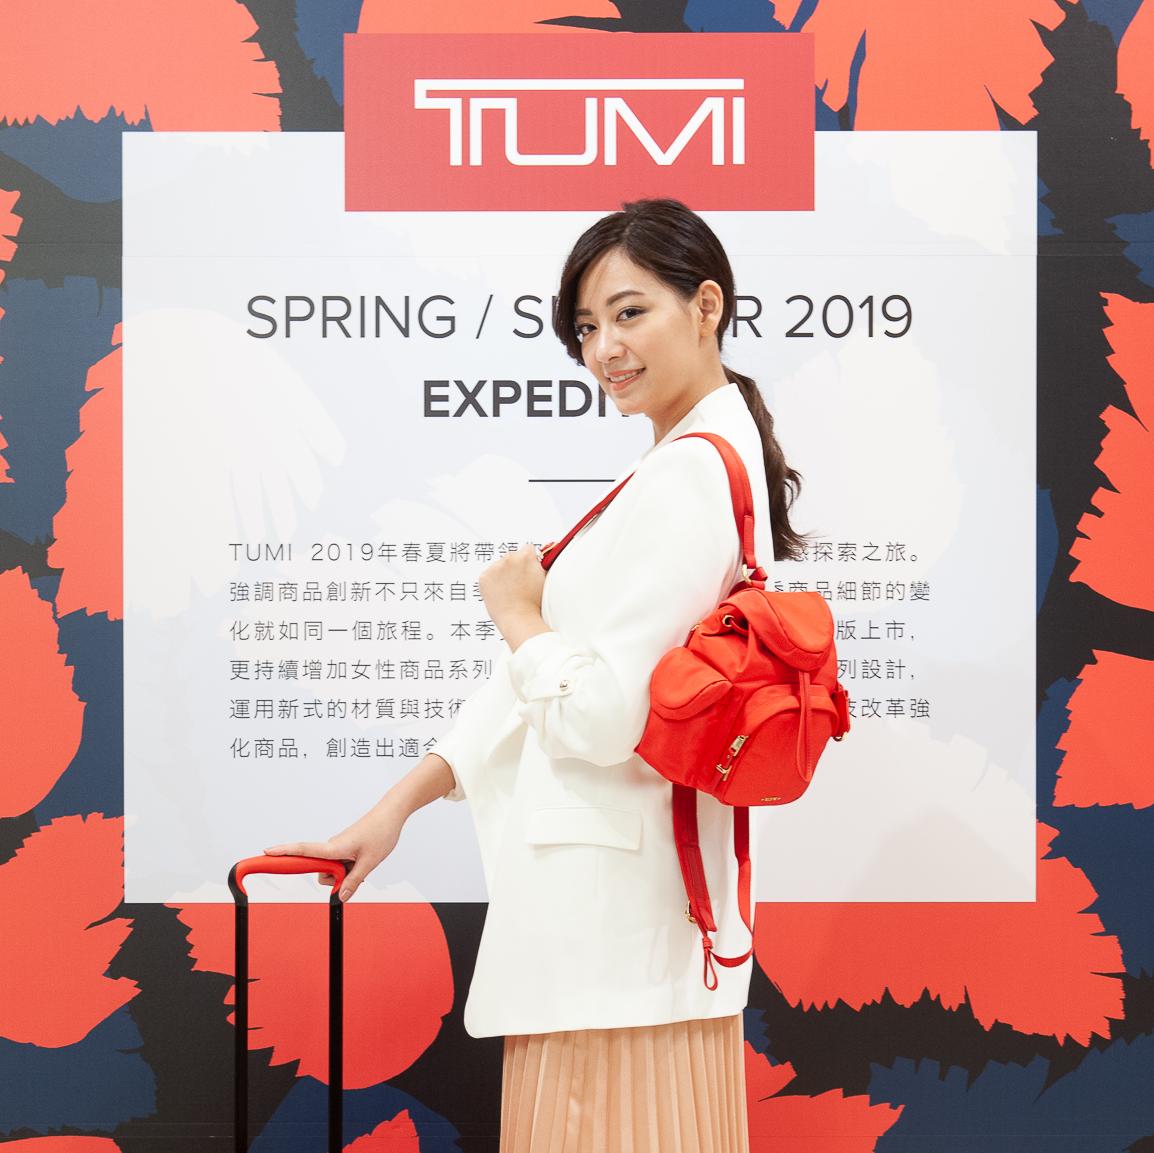 <p>創新美學,非凡工藝─TUMI 2019 春夏系列</p>